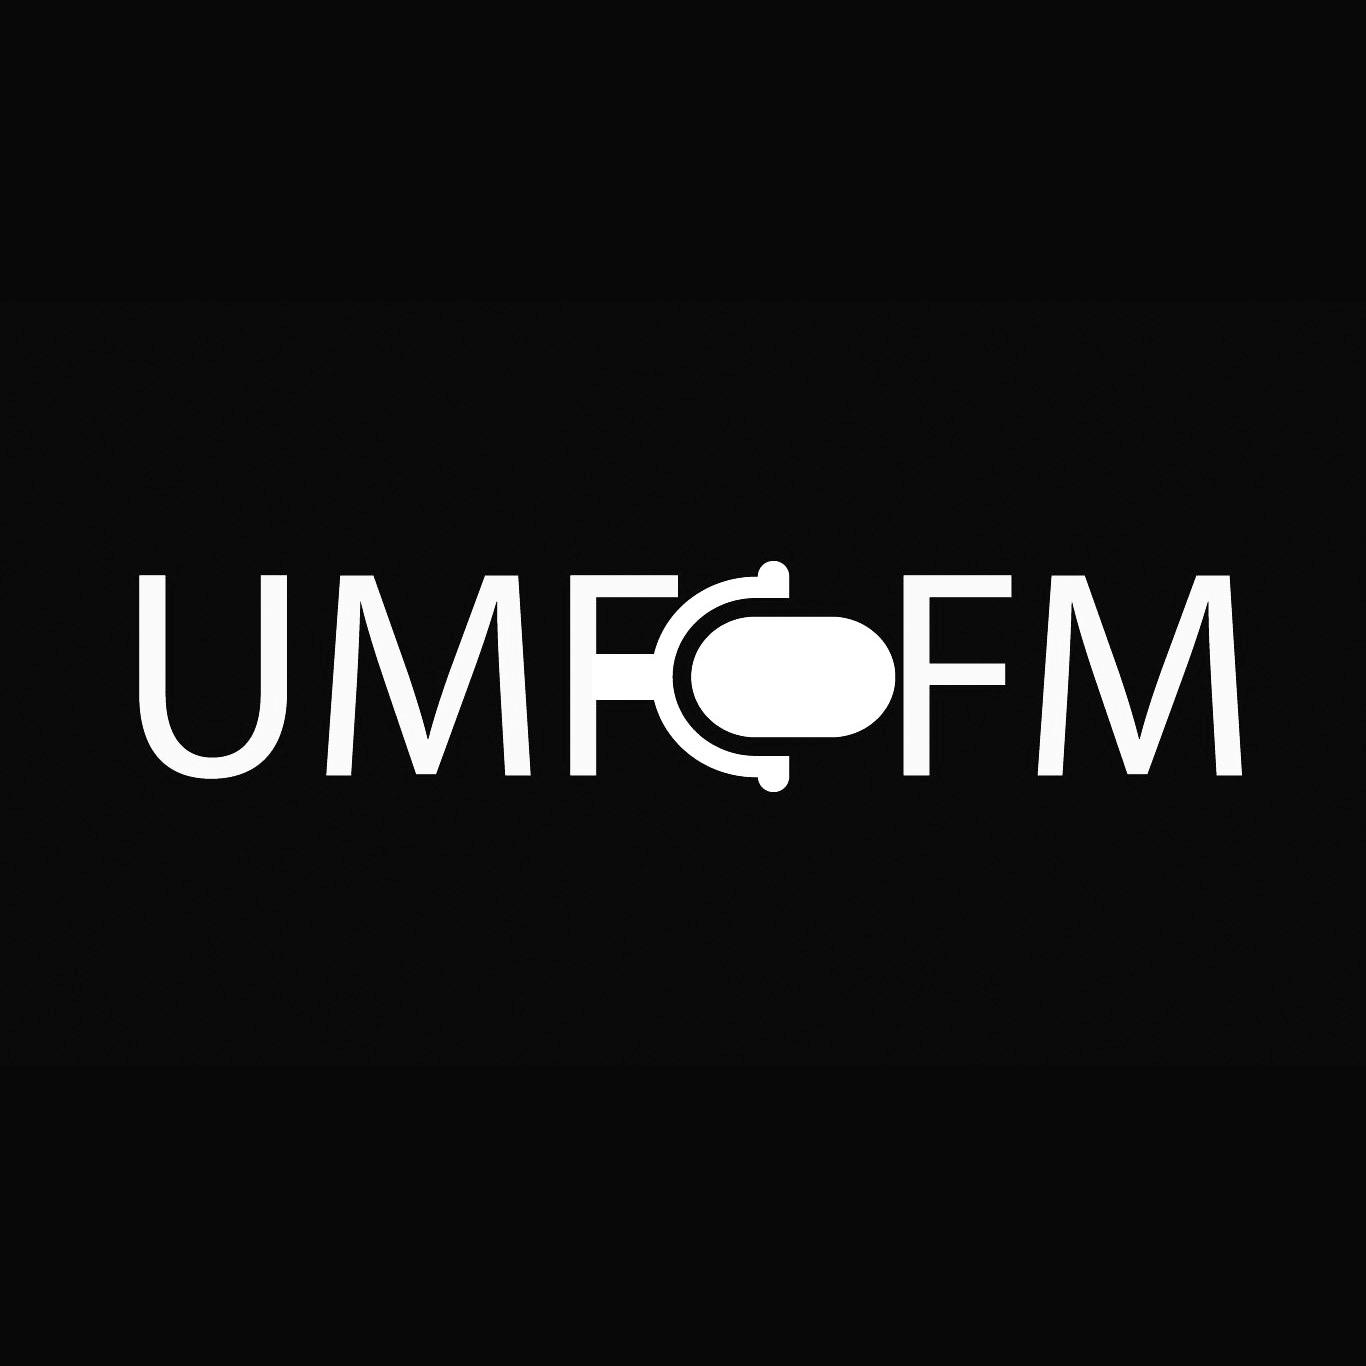 UMFC.FM